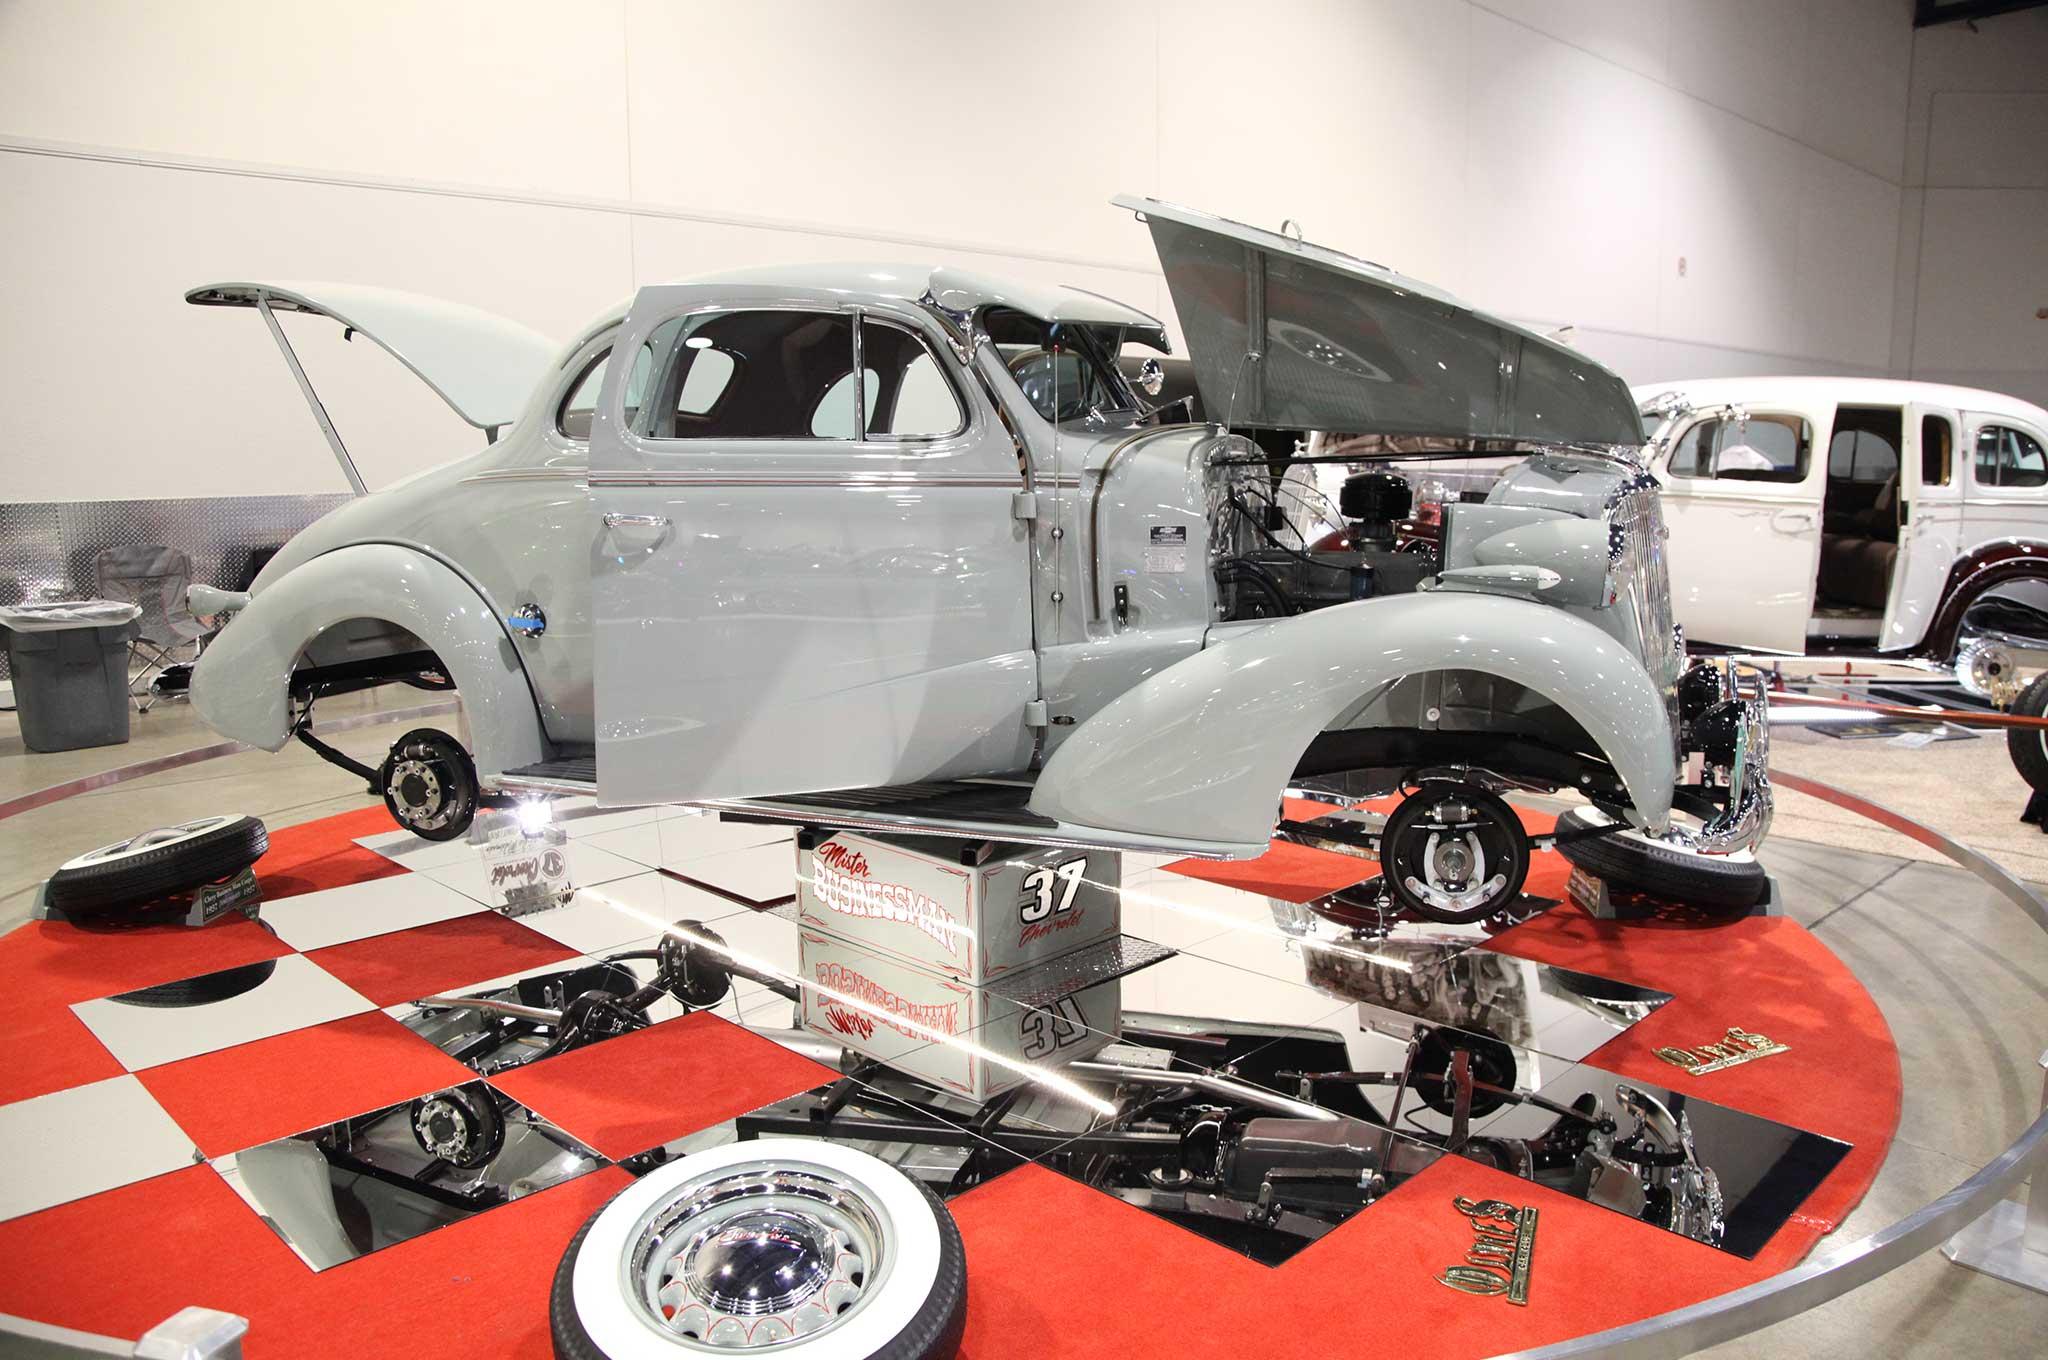 2015-las-vegas-super-show-winners-porfie-maldonado-1937-chevy-business-coupe